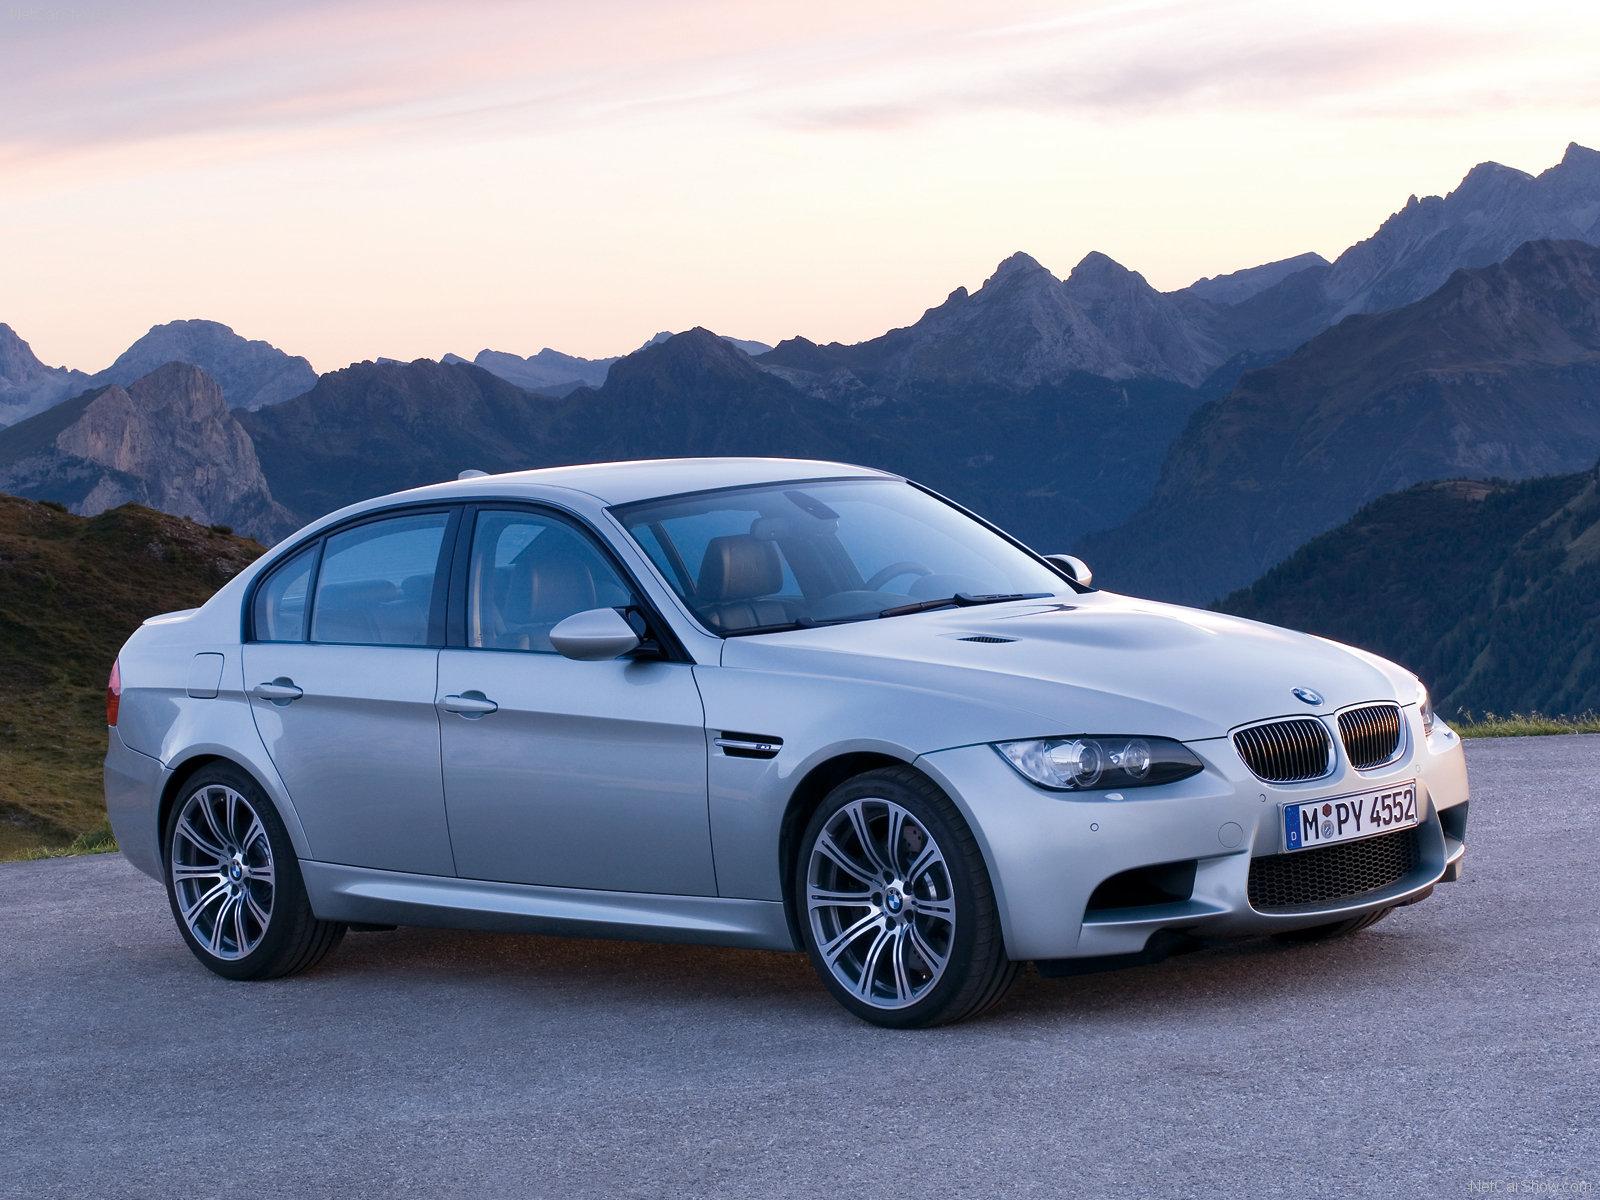 BMW M3 Sedan 2008 1600x1200 wallpaper 01 Wallpaper bmw tuning